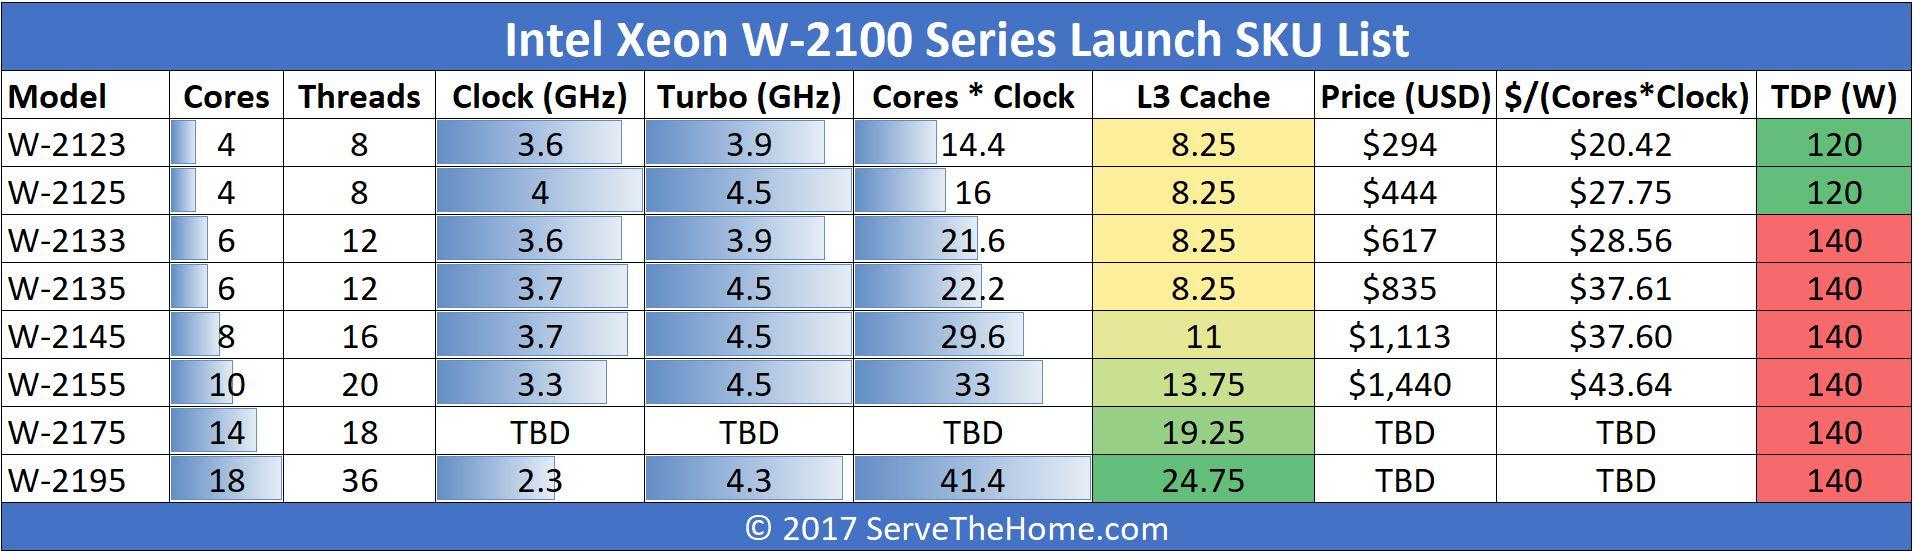 Intel Xeon W 2100 Series SKUs And Value Comparison